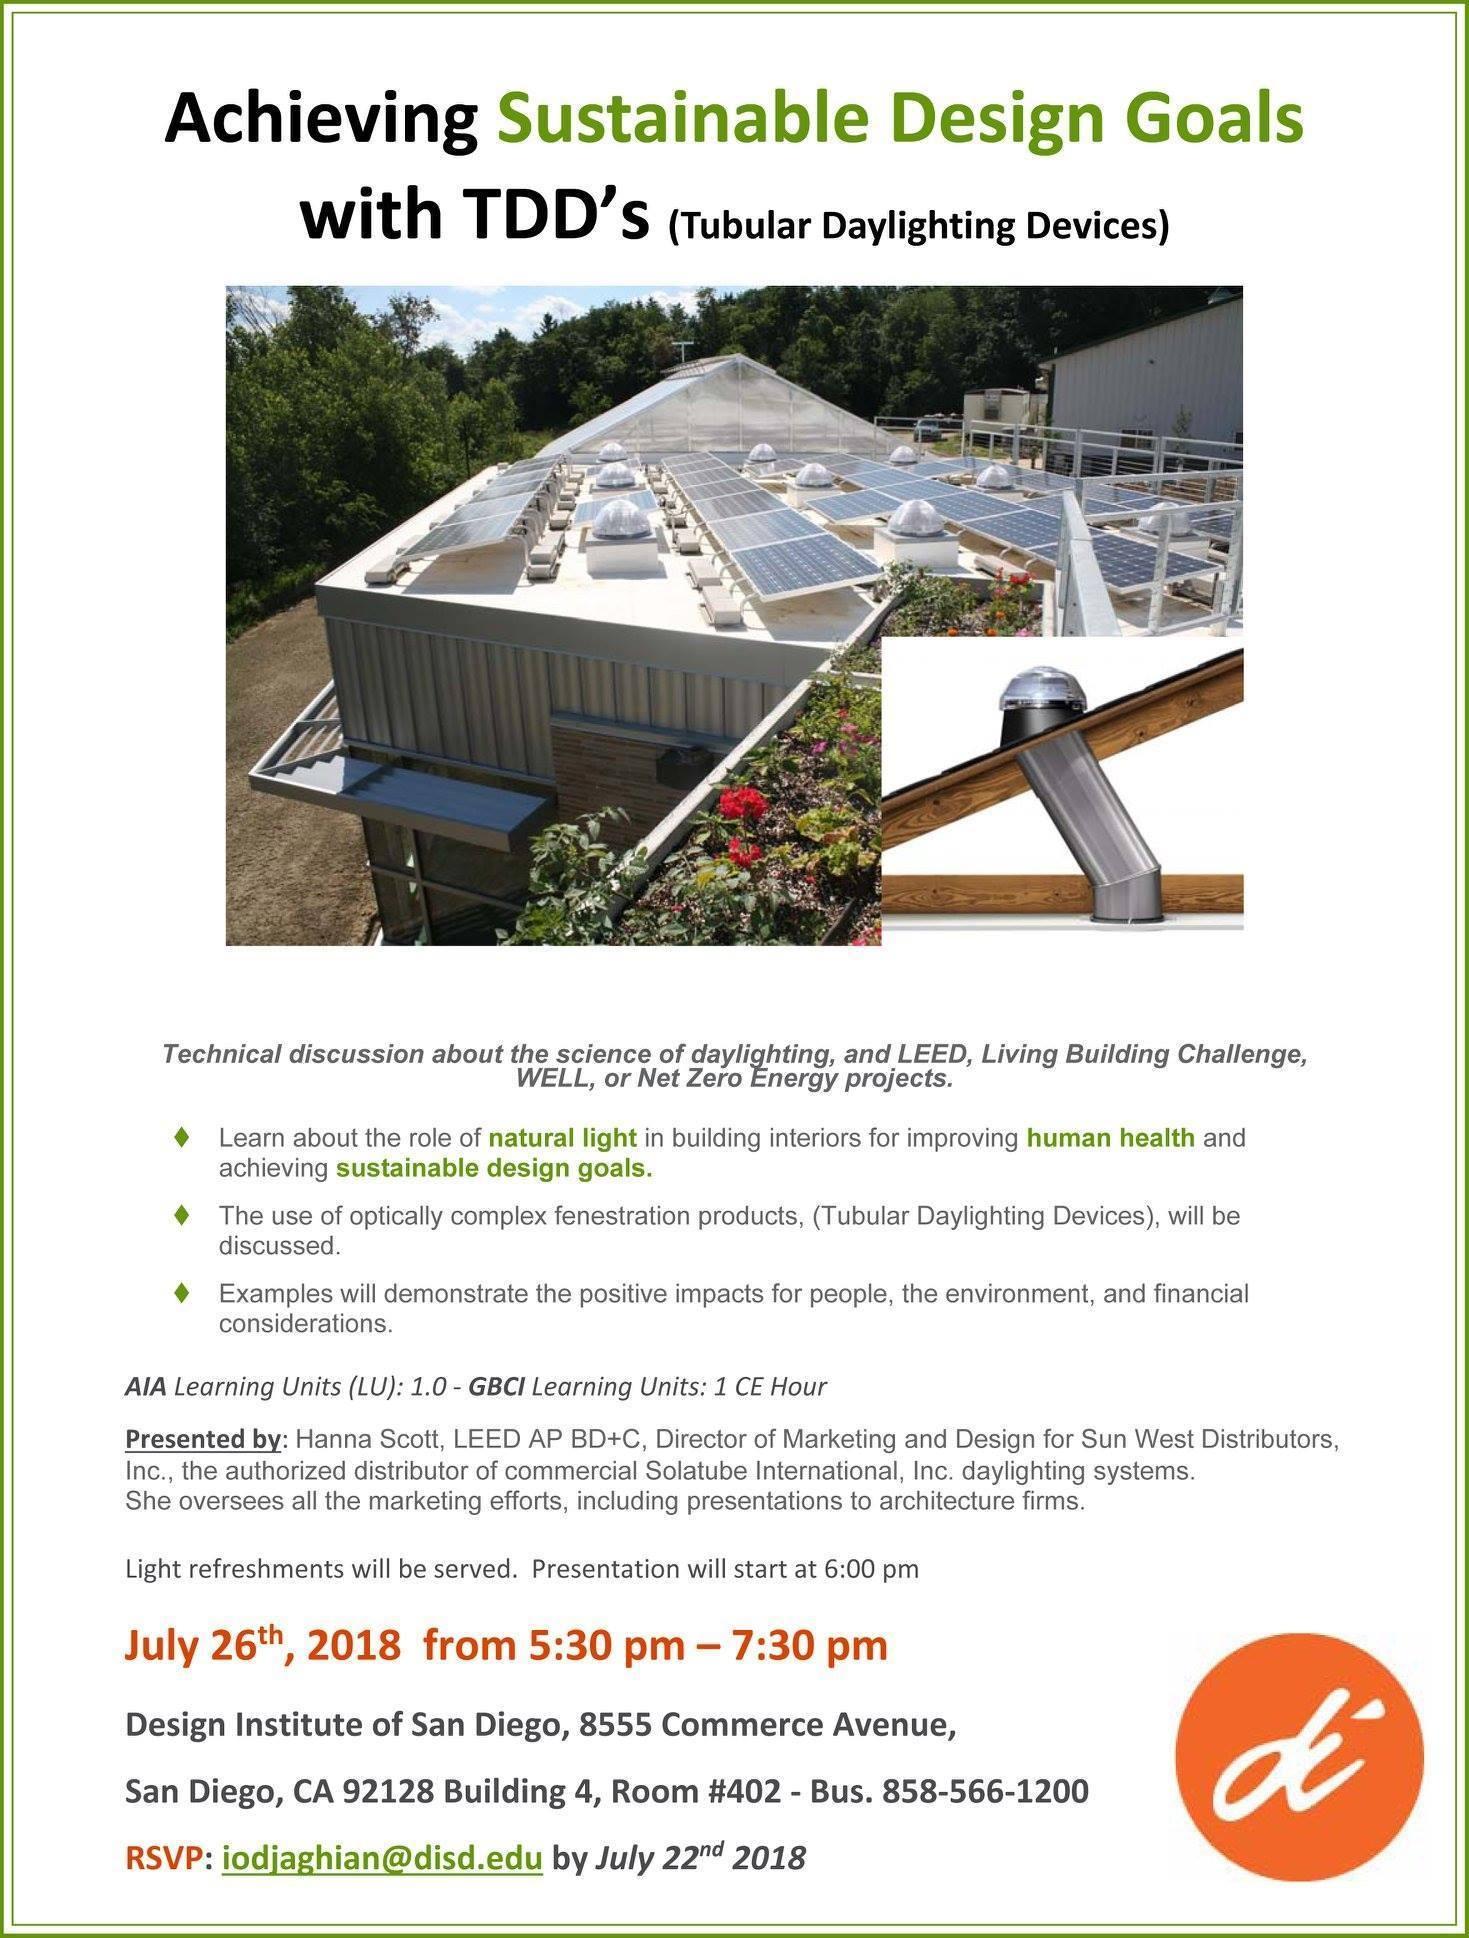 tubular daylighting devices rsvp iodjaghiandisdedu by july 22 2018 upcoming events interior design community